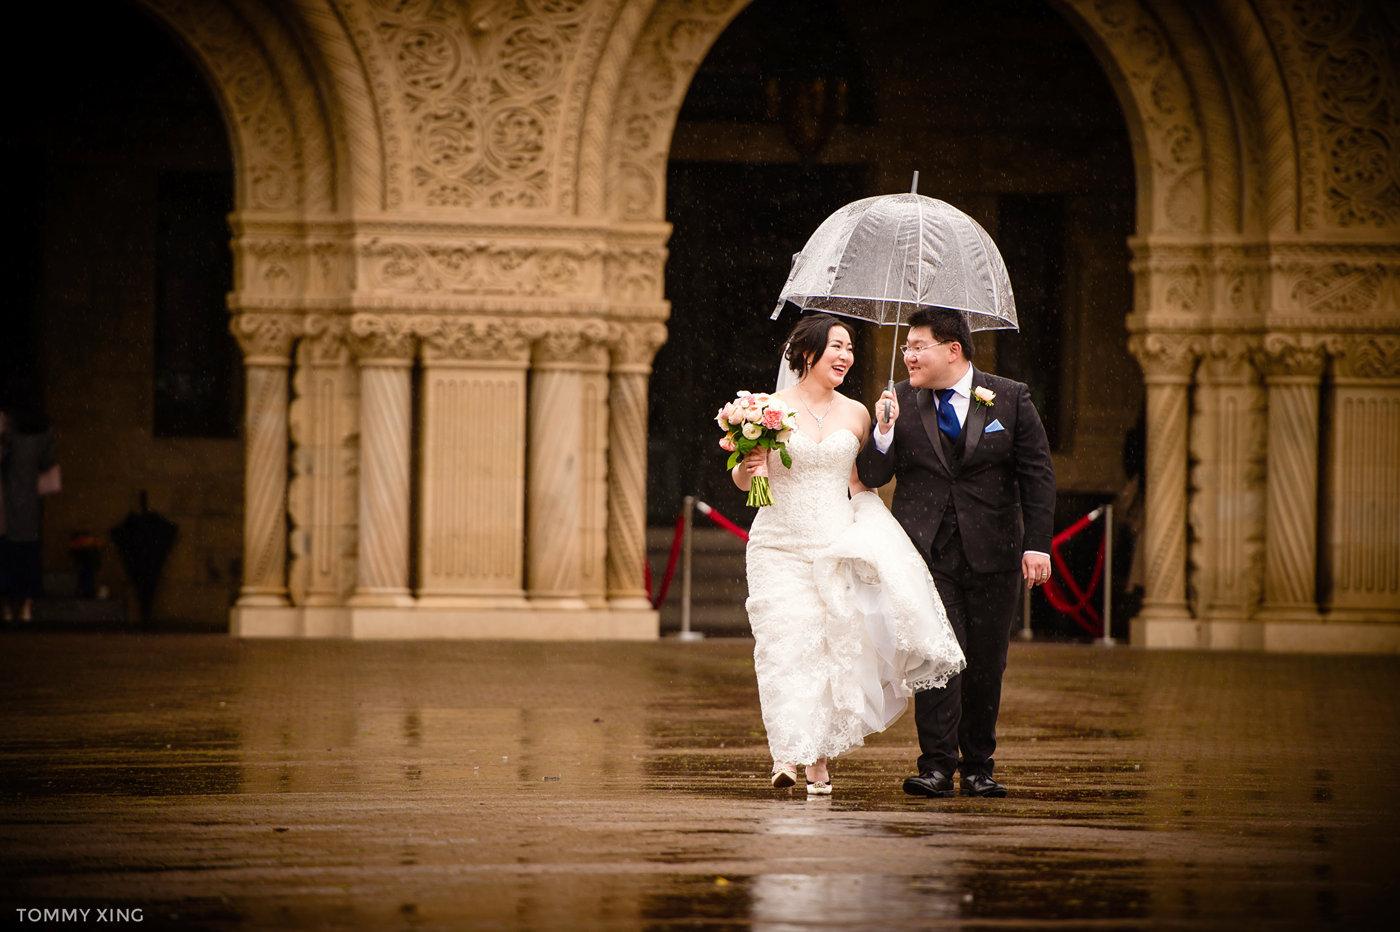 STANFORD MEMORIAL CHURCH WEDDING - Wenjie & Chengcheng - SAN FRANCISCO BAY AREA 斯坦福教堂婚礼跟拍 - 洛杉矶婚礼婚纱照摄影师 Tommy Xing Photography157.jpg